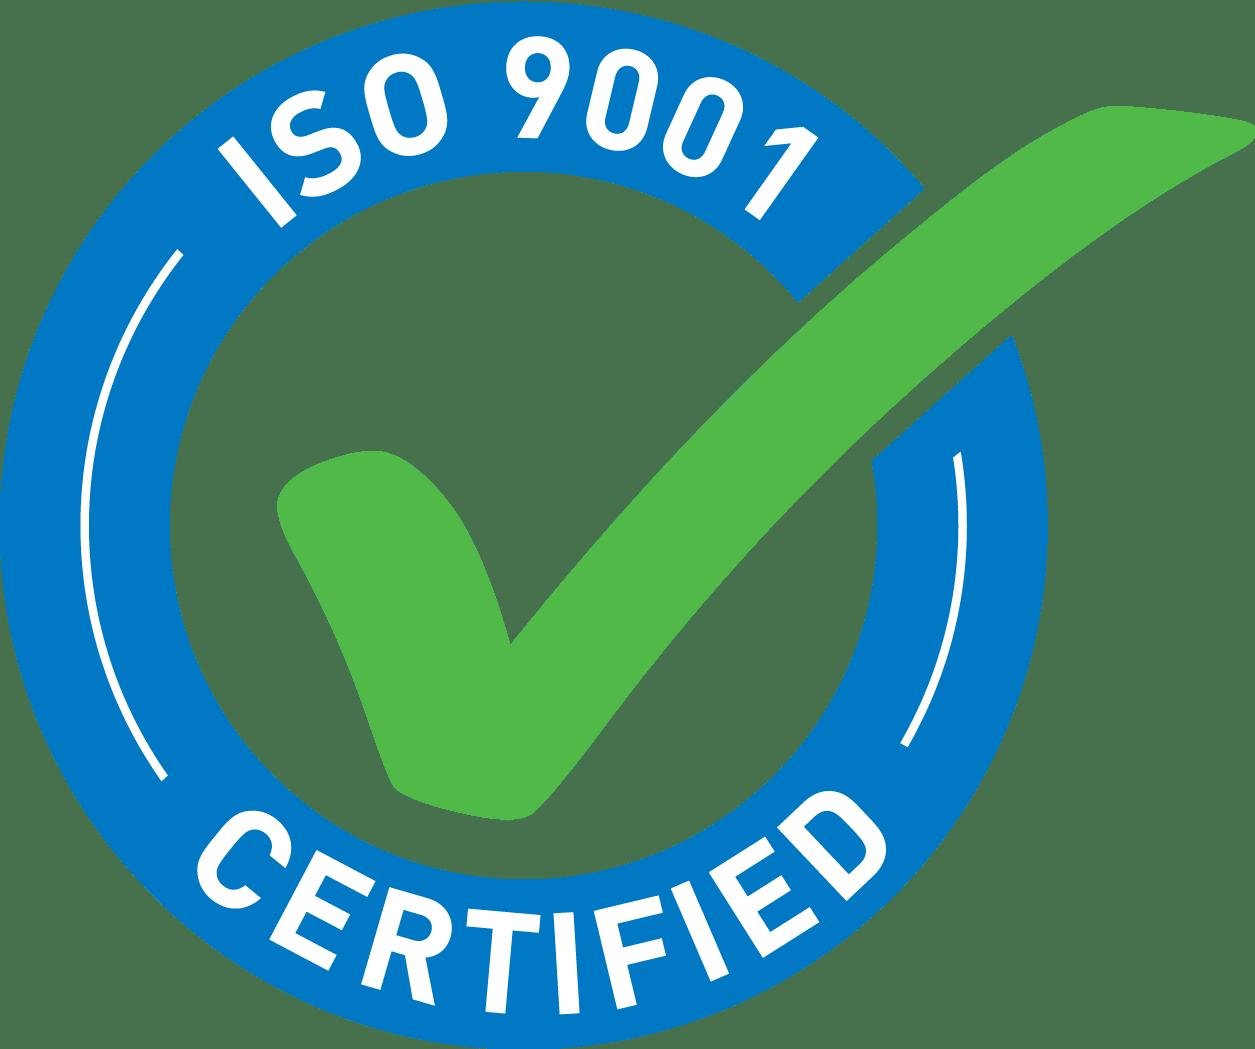 picto-noblet-iso-9001-ok